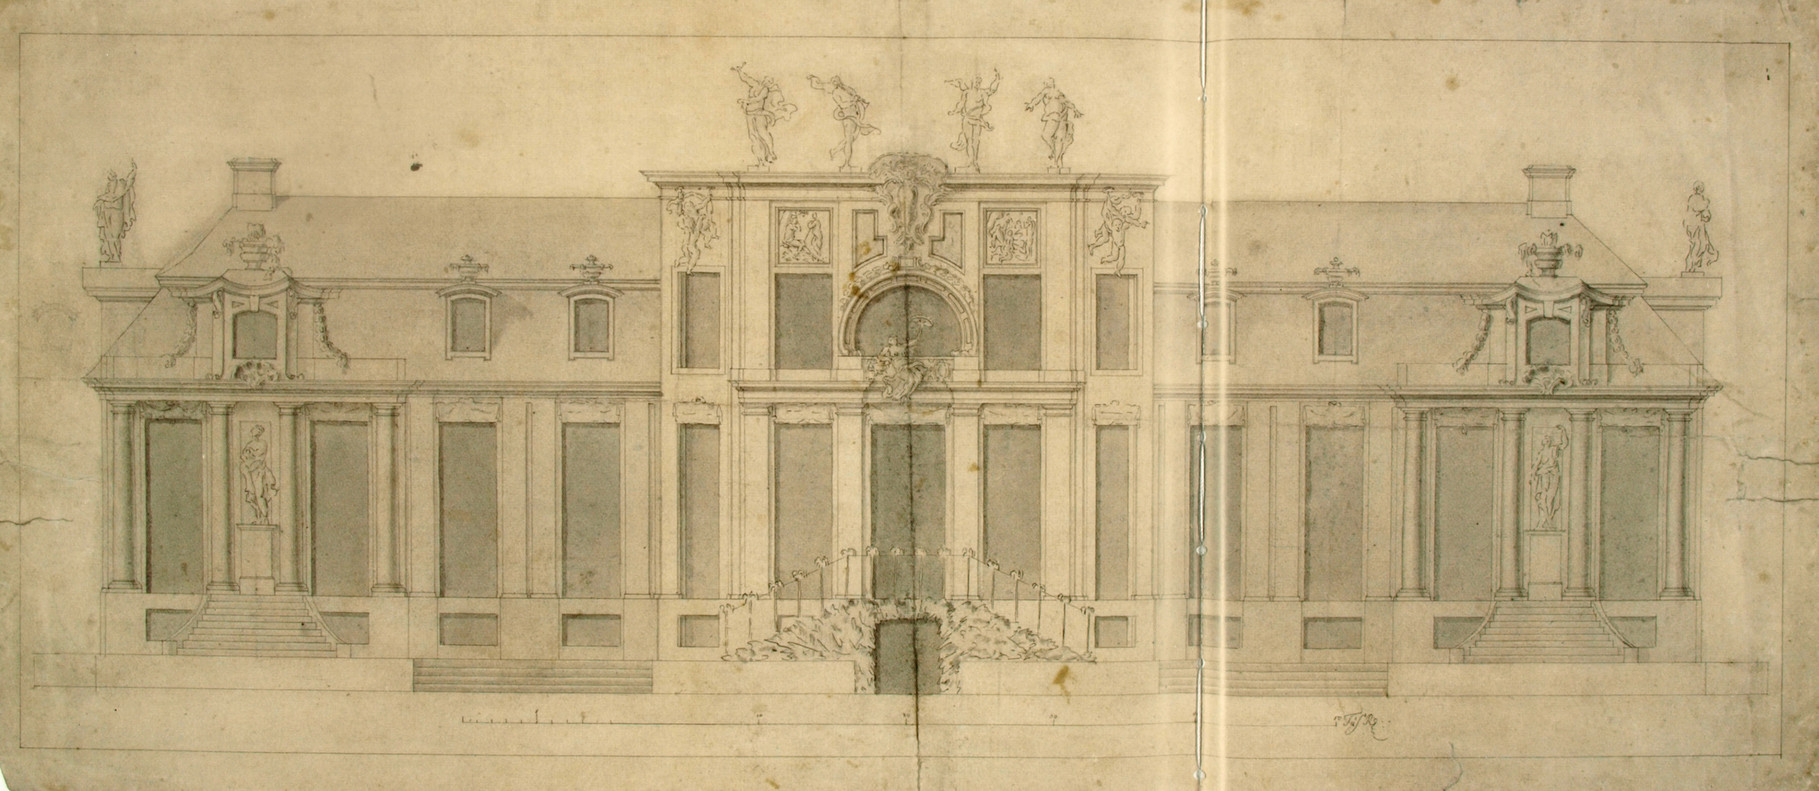 Entwurf, Villa Kamecke